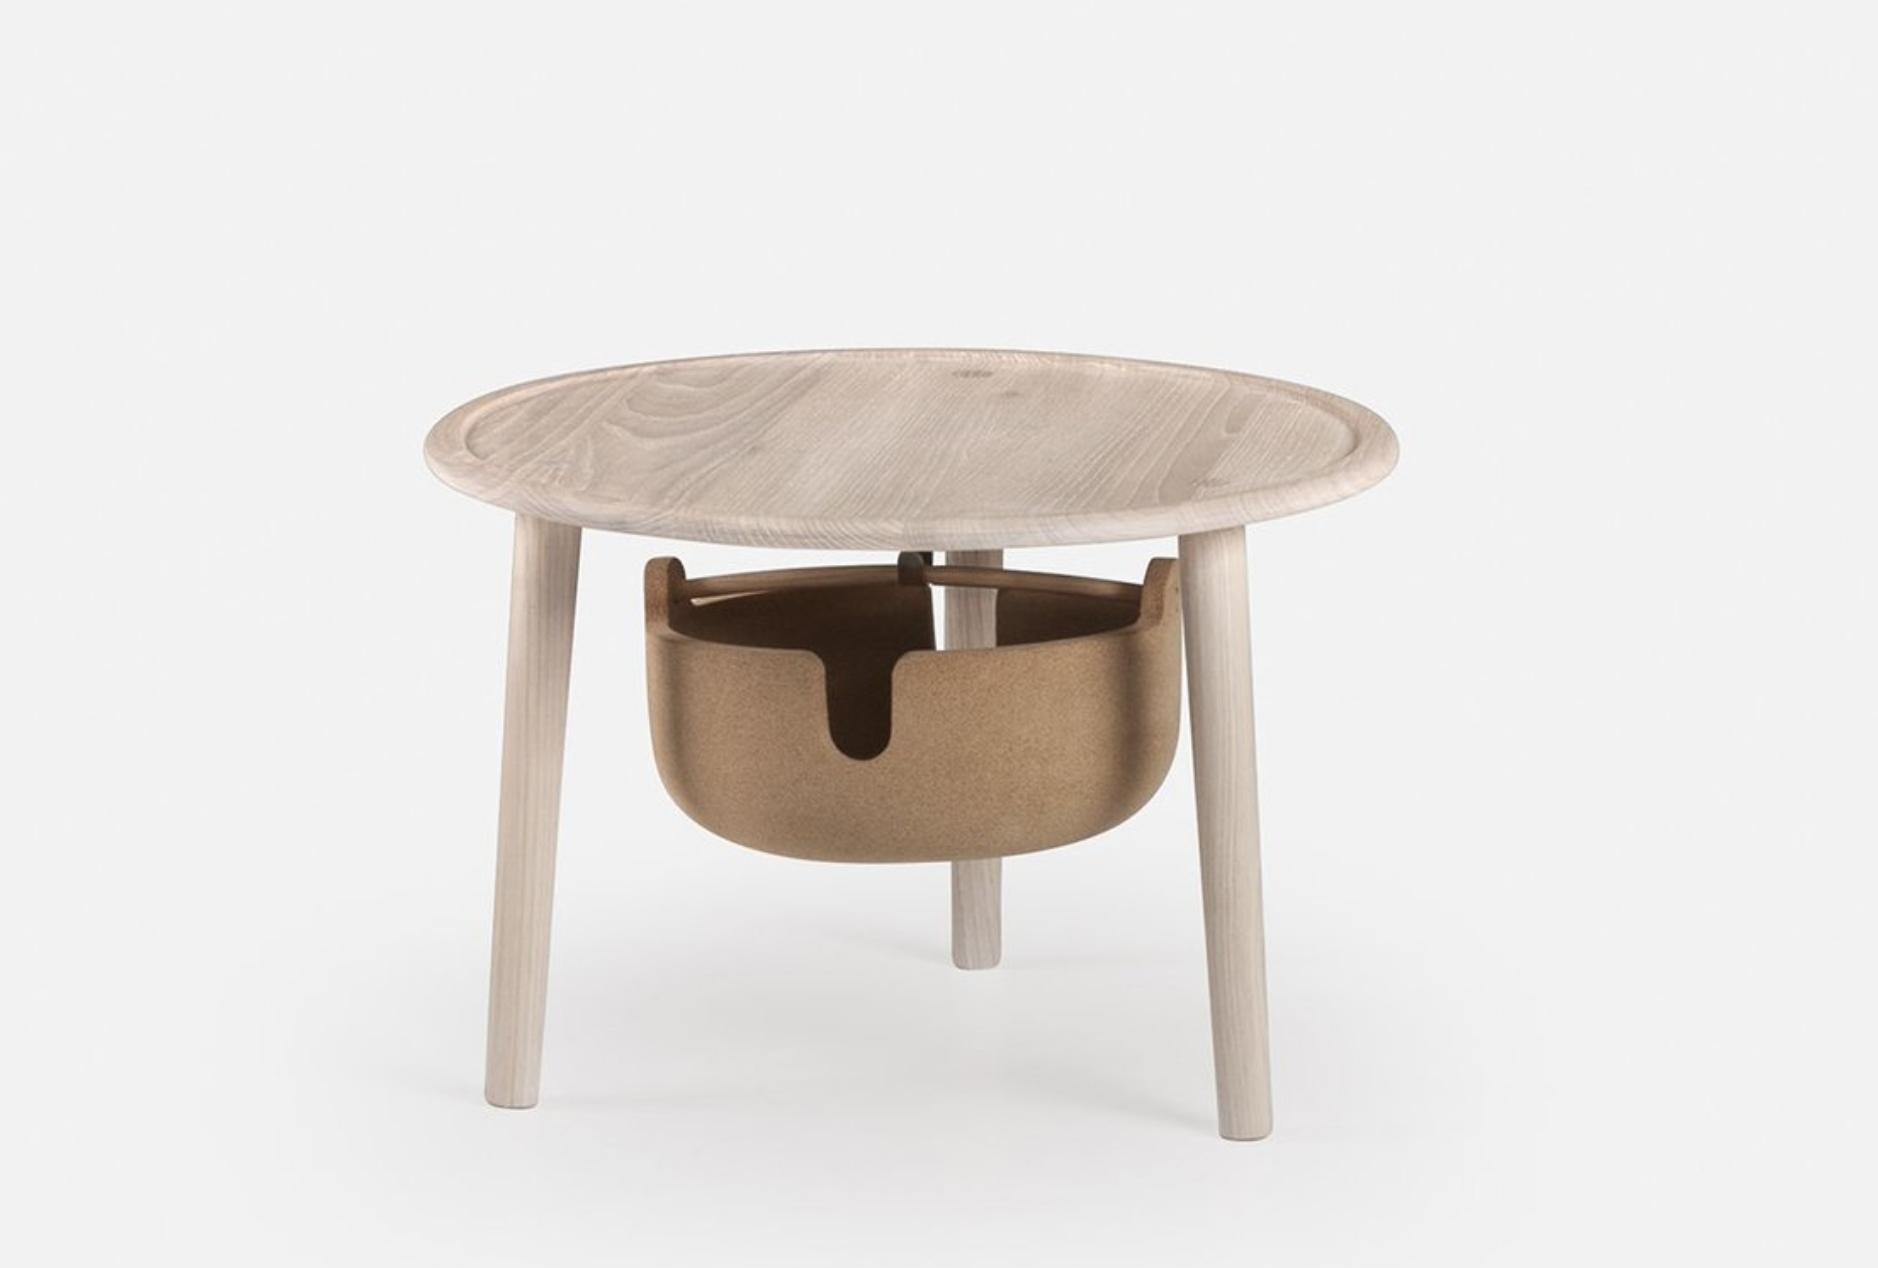 Companions Low bedside table with cork basket by De La Espada